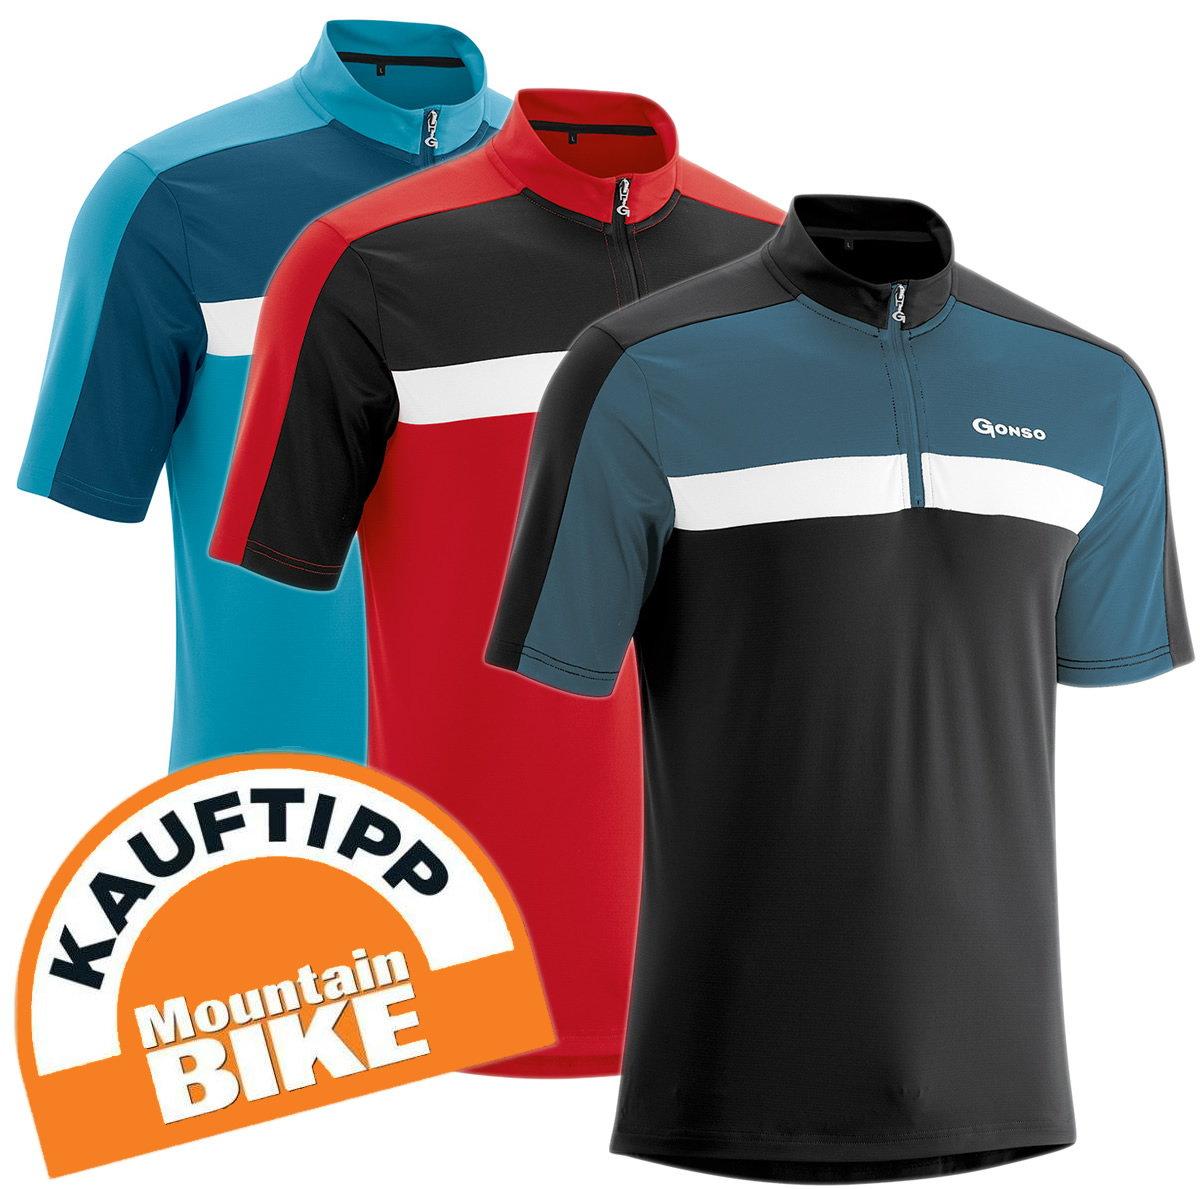 Gonso Gerd Herren Fahrrad Trikot Shirt - Alle Größen XXL-8XL